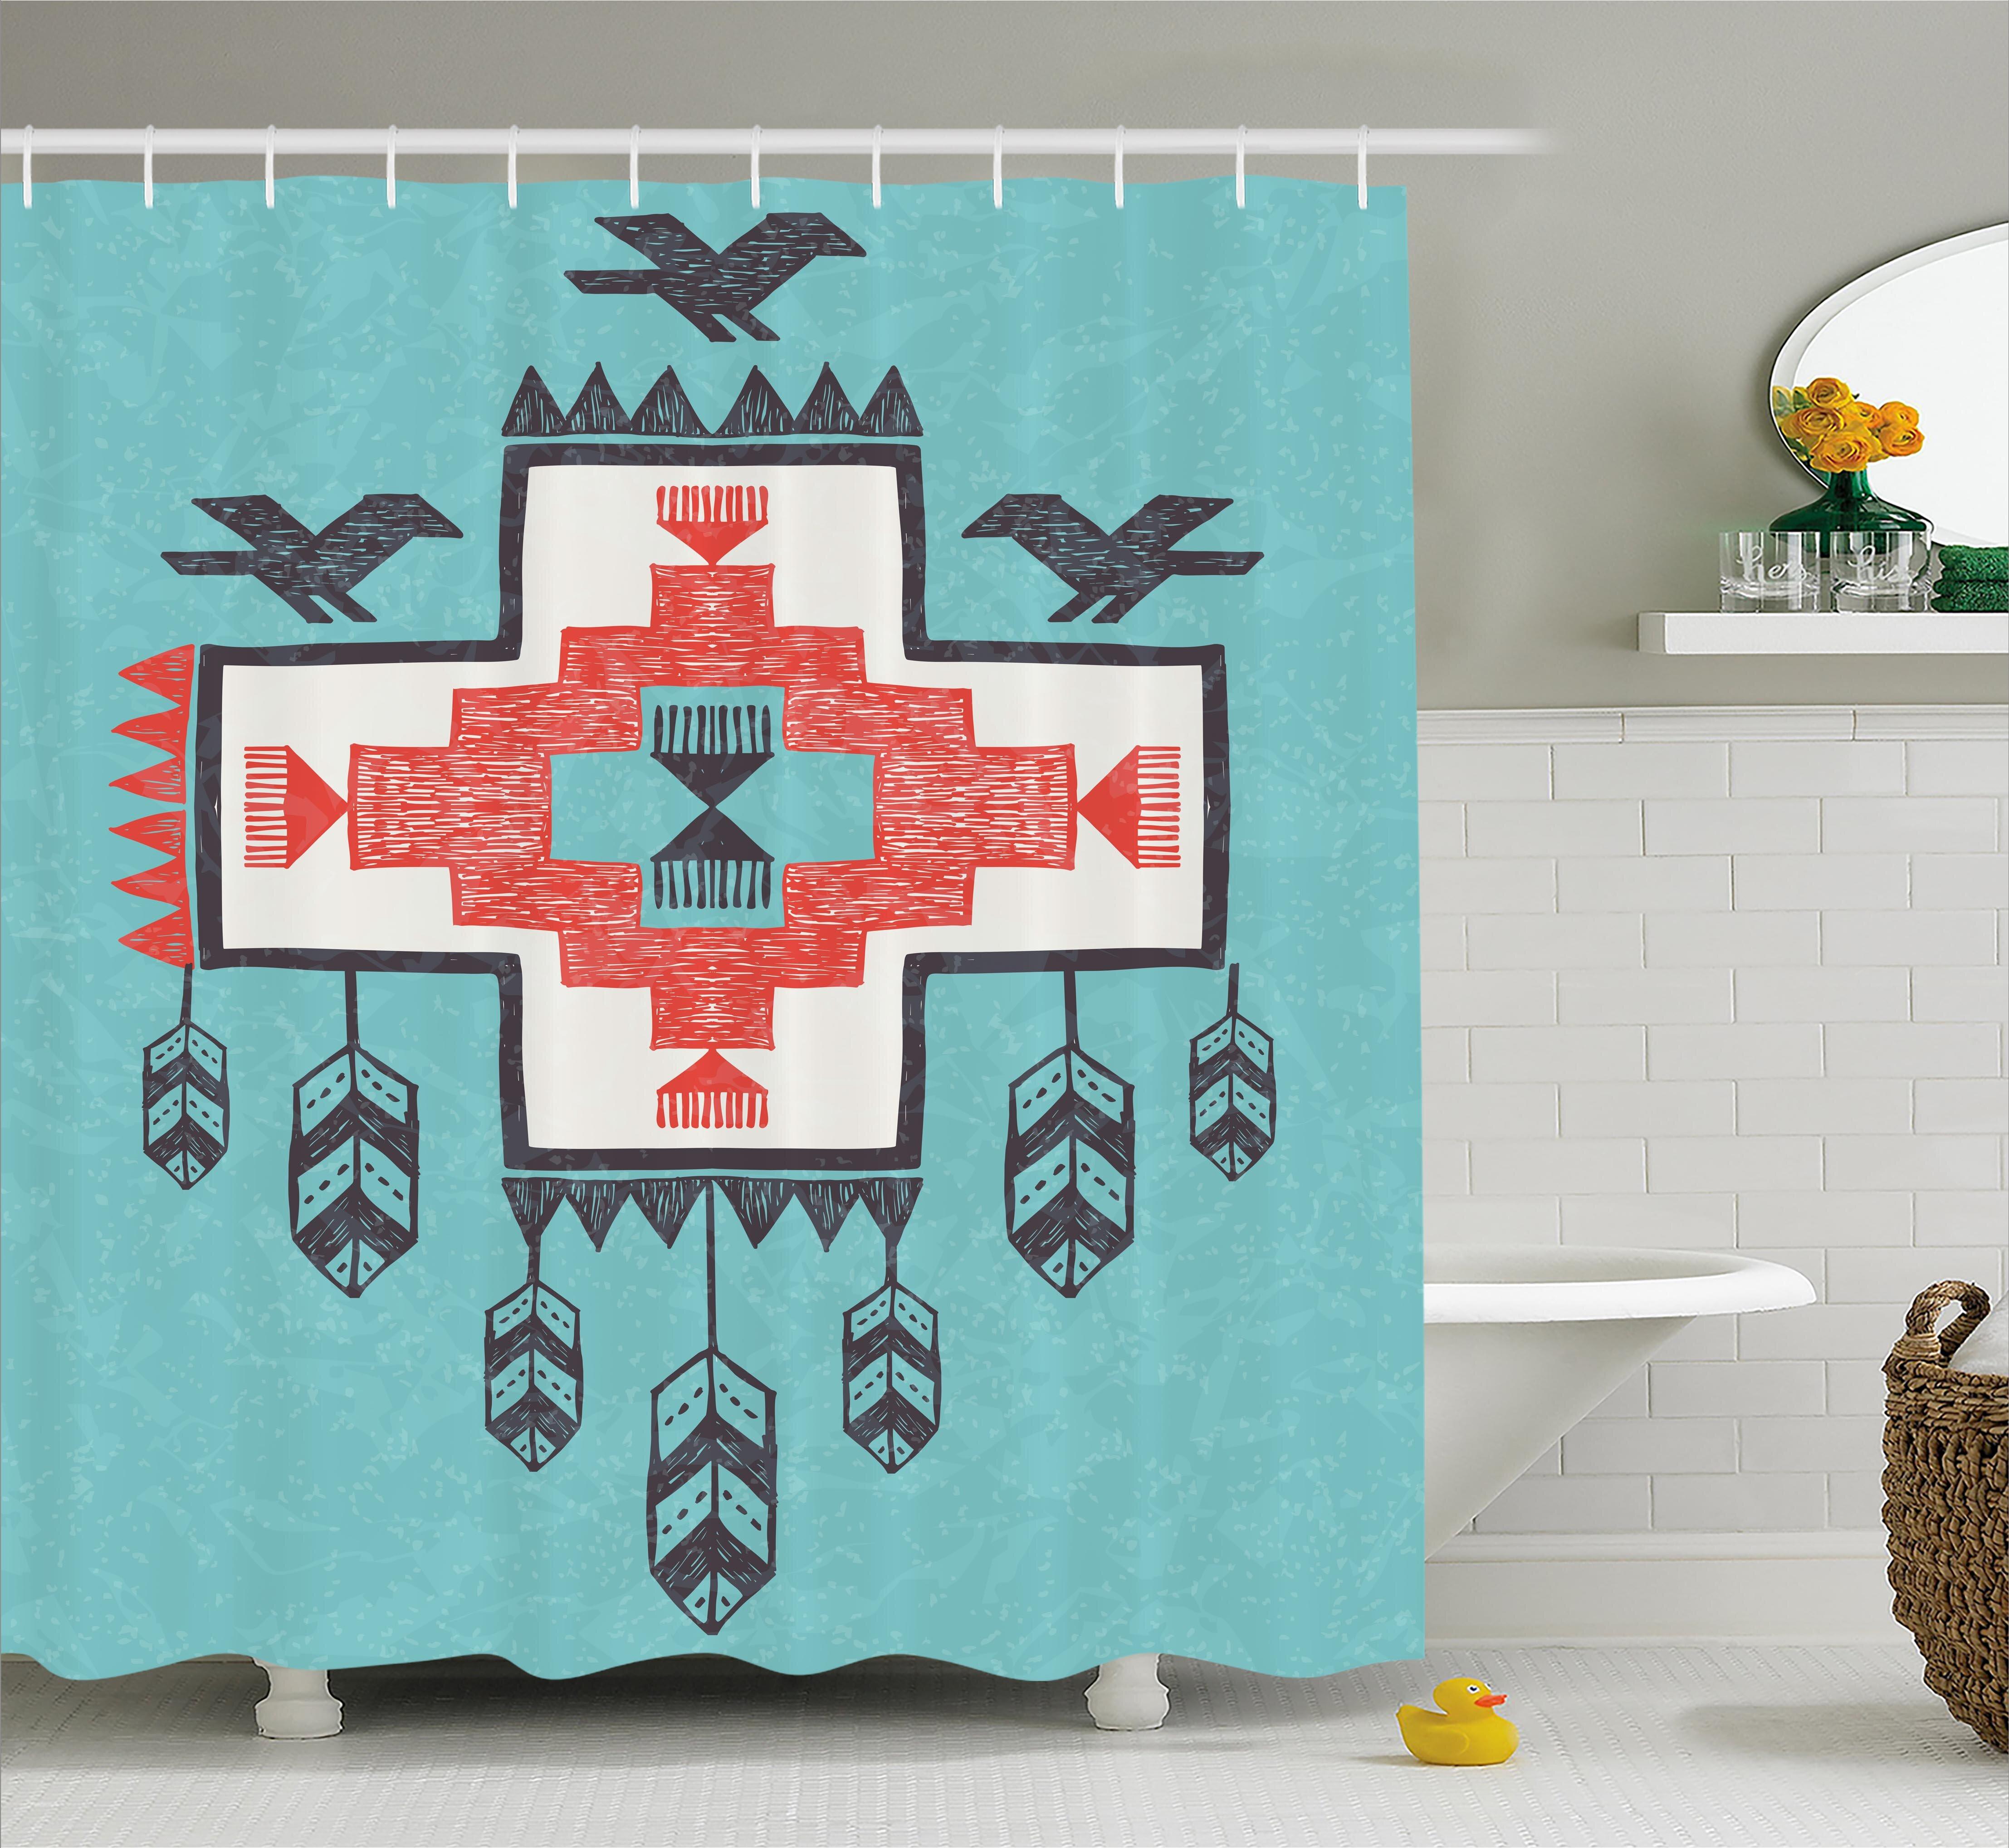 East Urban Home Icons Birds Native American Decor Shower Curtain